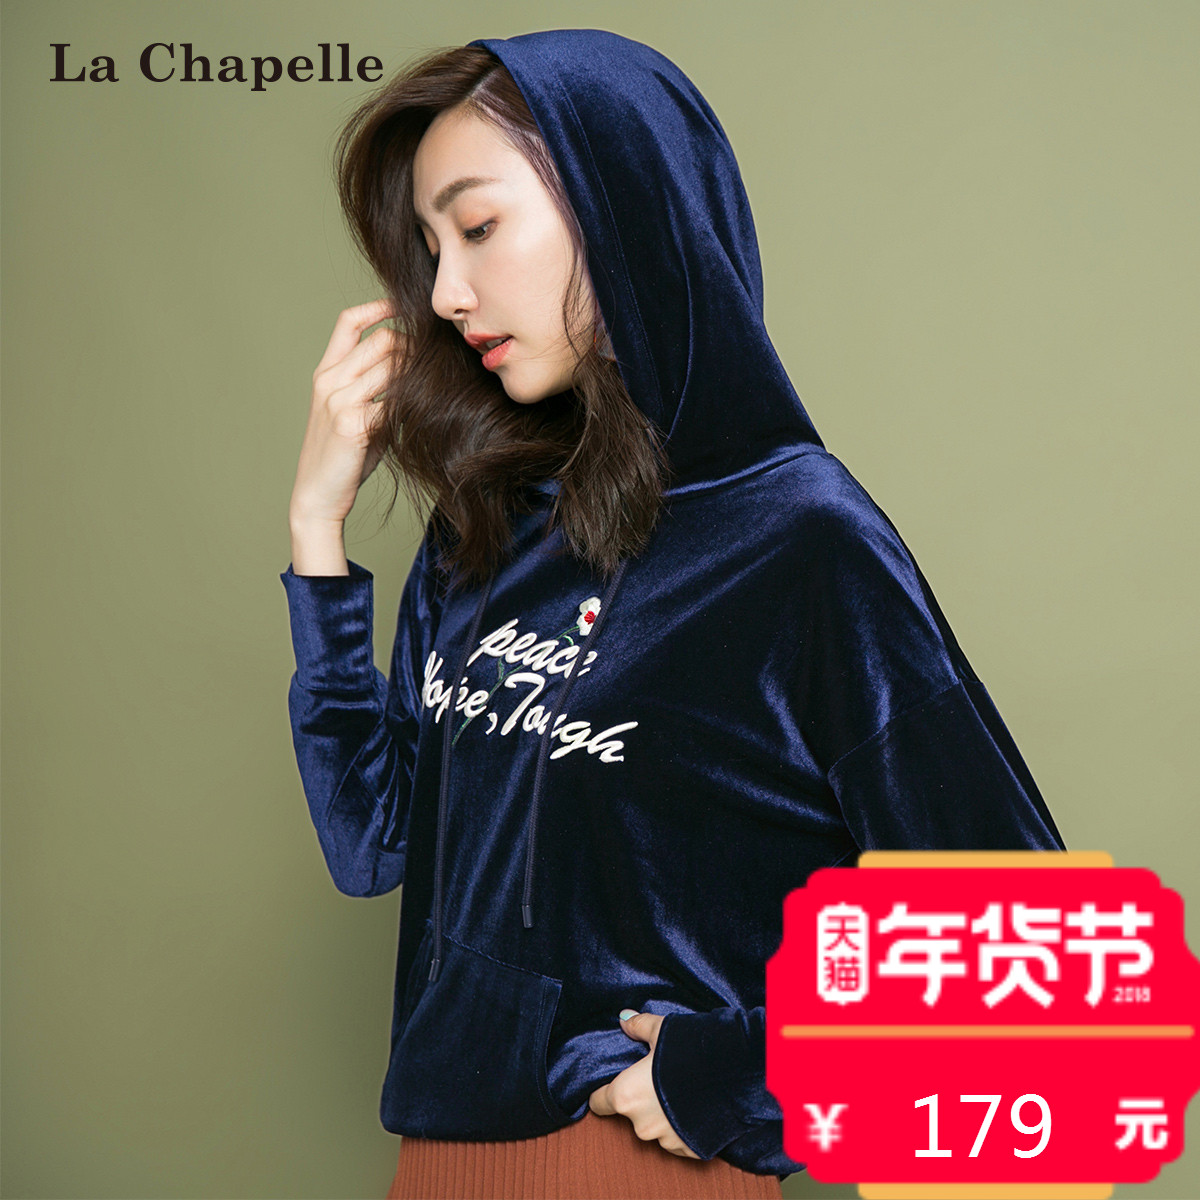 La+Chapelle拉夏贝尔牌子的丝绒卫衣价钱算贵吗?有没有优惠券